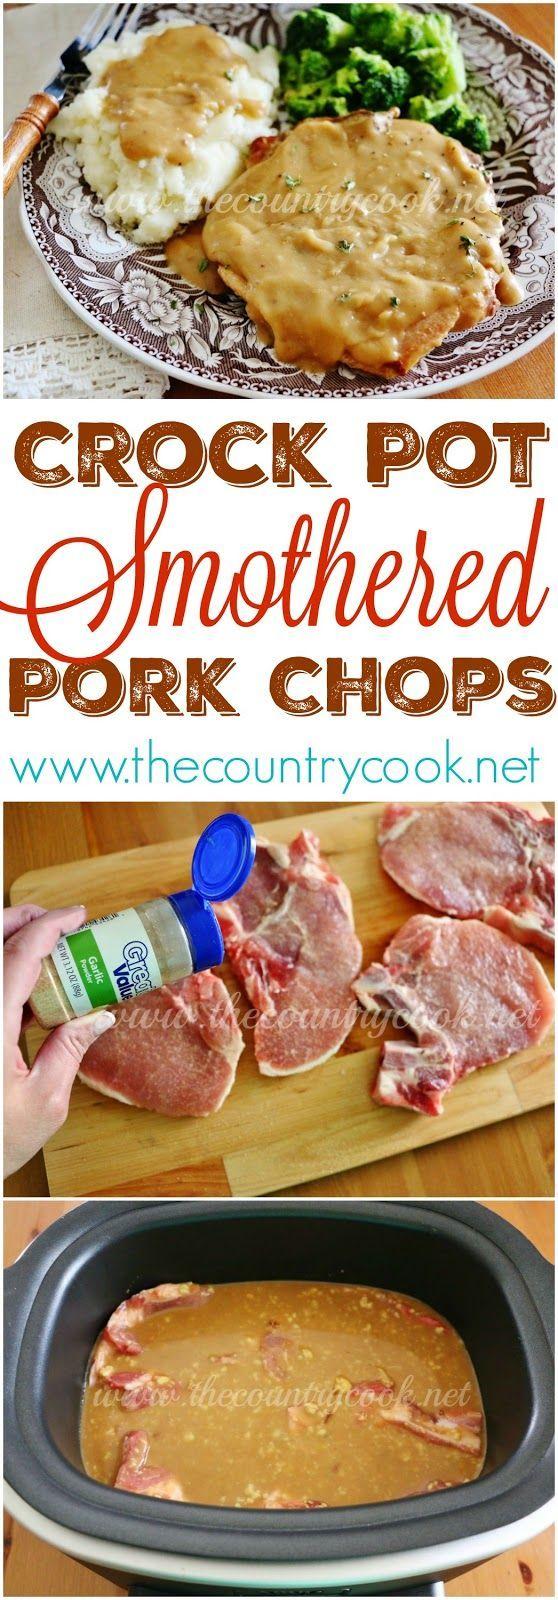 Crock Pot Pork Chops with Gravy #crockpotmeals